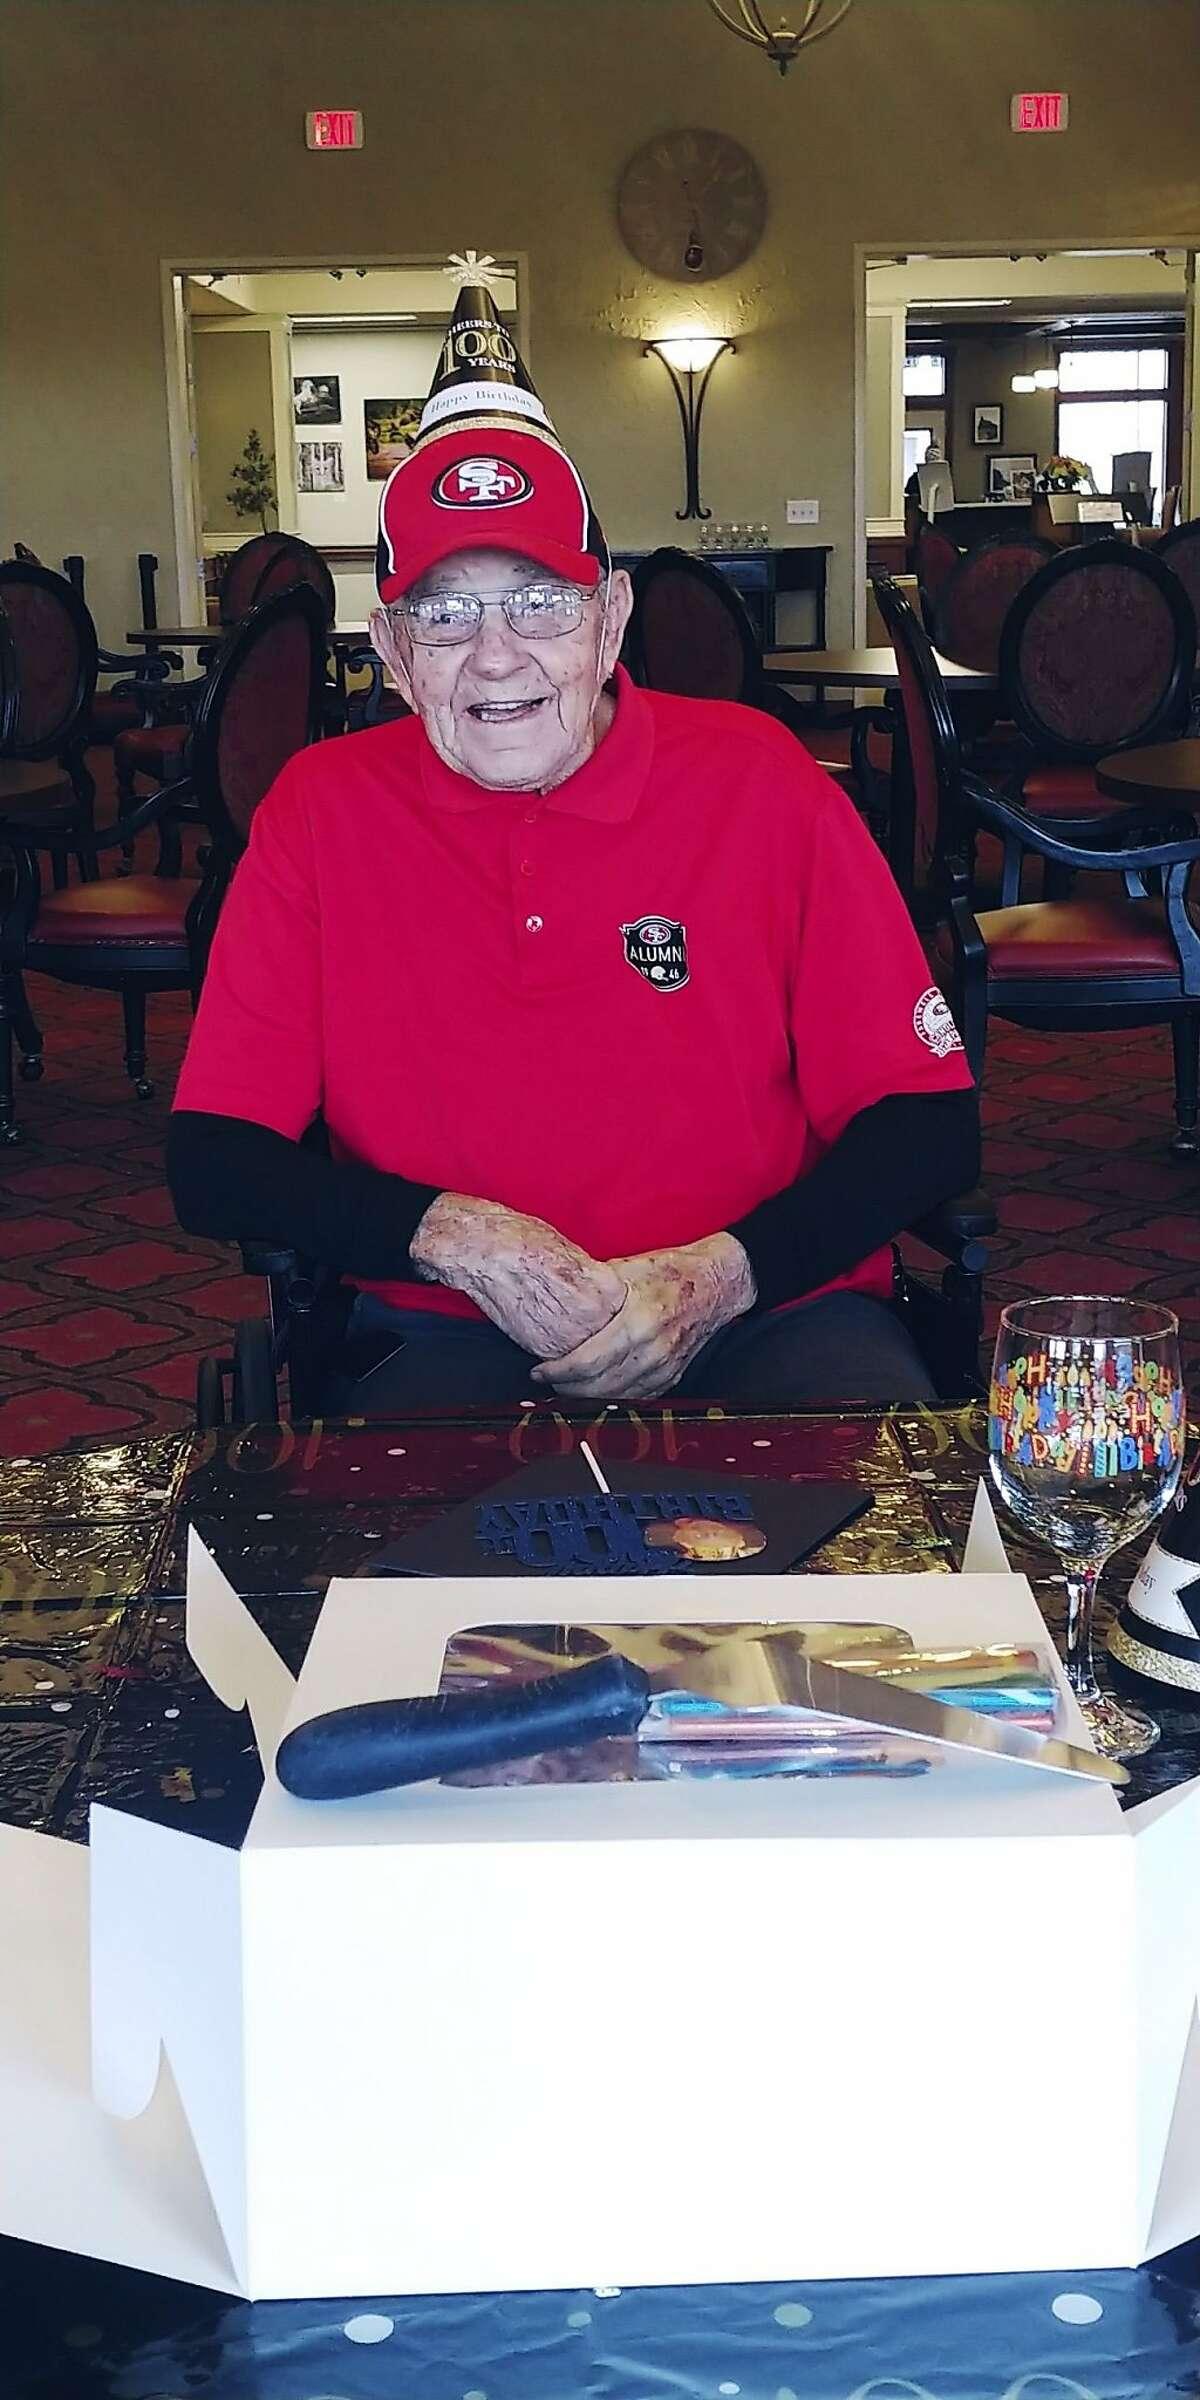 Ken Casanega celebrating his 100th birthday at The Springs at Veranda Park, a senior living center in Medford, Ore.